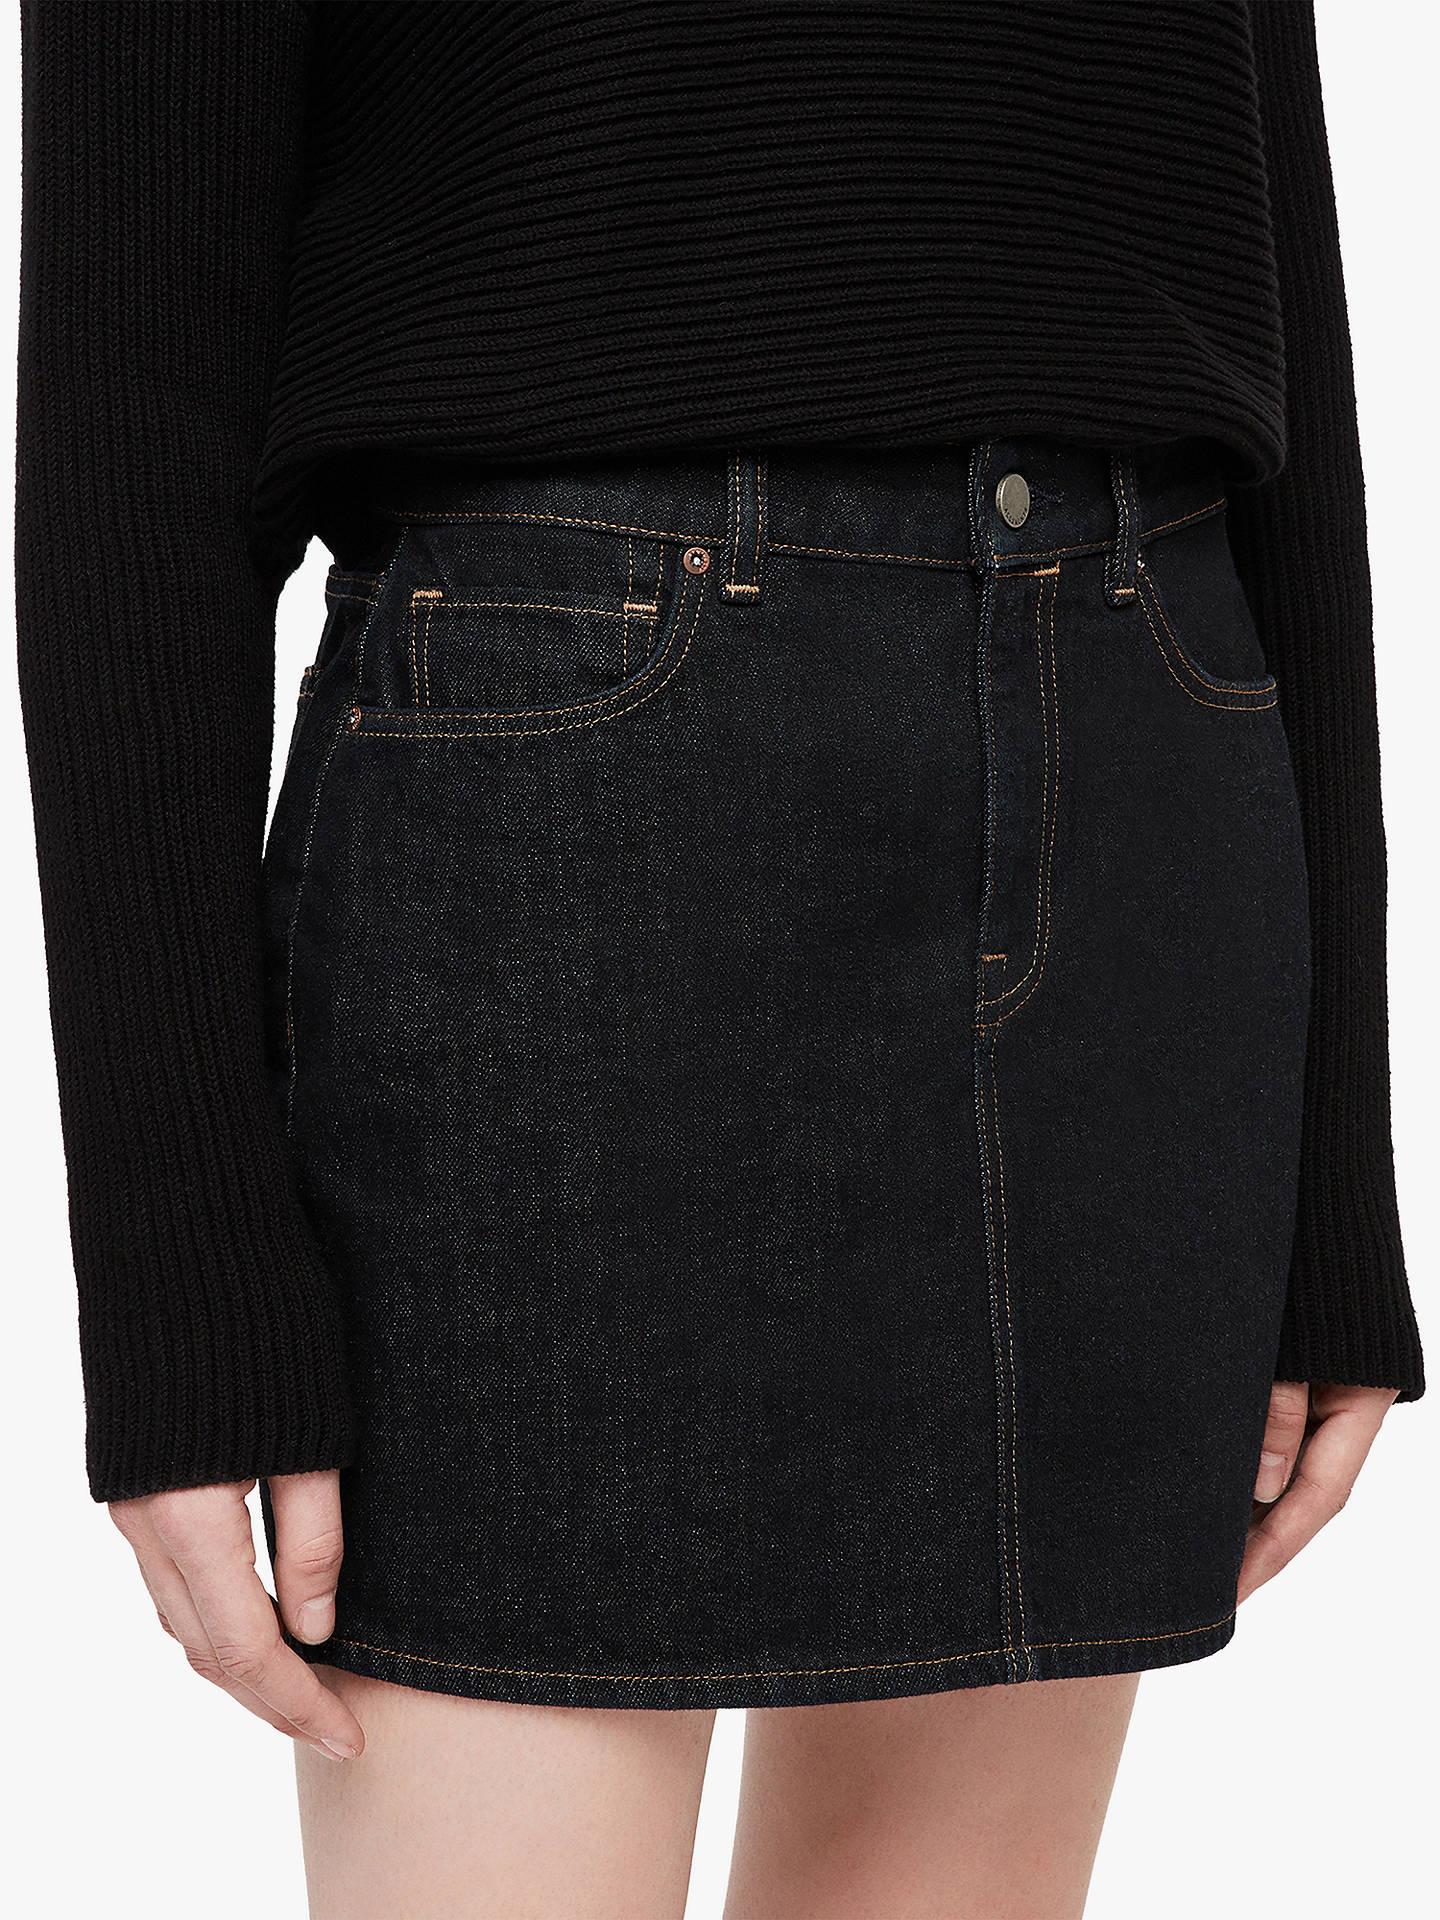 457b1bdaf77d39 Buy AllSaints Betty Denim Skirt, Indigo Blue Rinse, 12 Online at  johnlewis.com ...